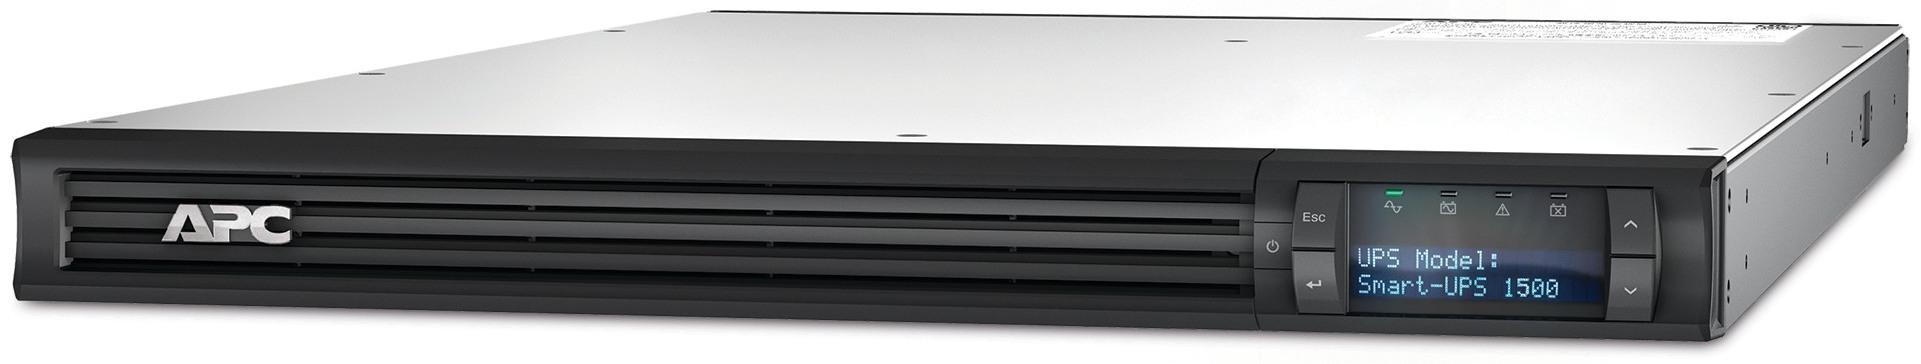 APC-by-Schneider-Electric-Smart-UPS-SMT1500RMI1U